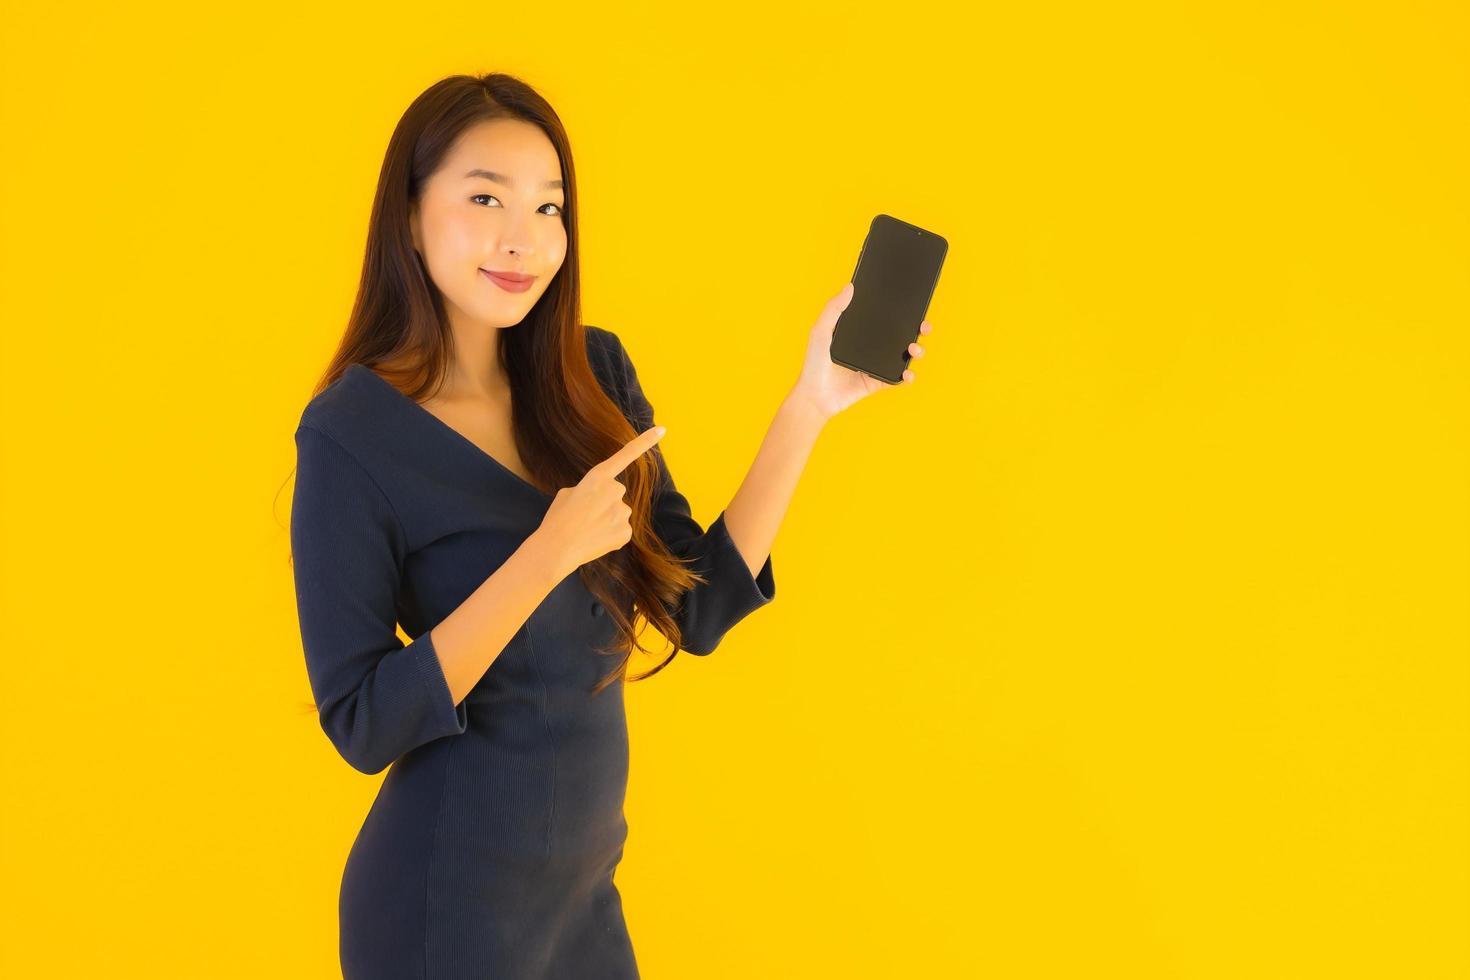 femme pointant vers téléphone photo